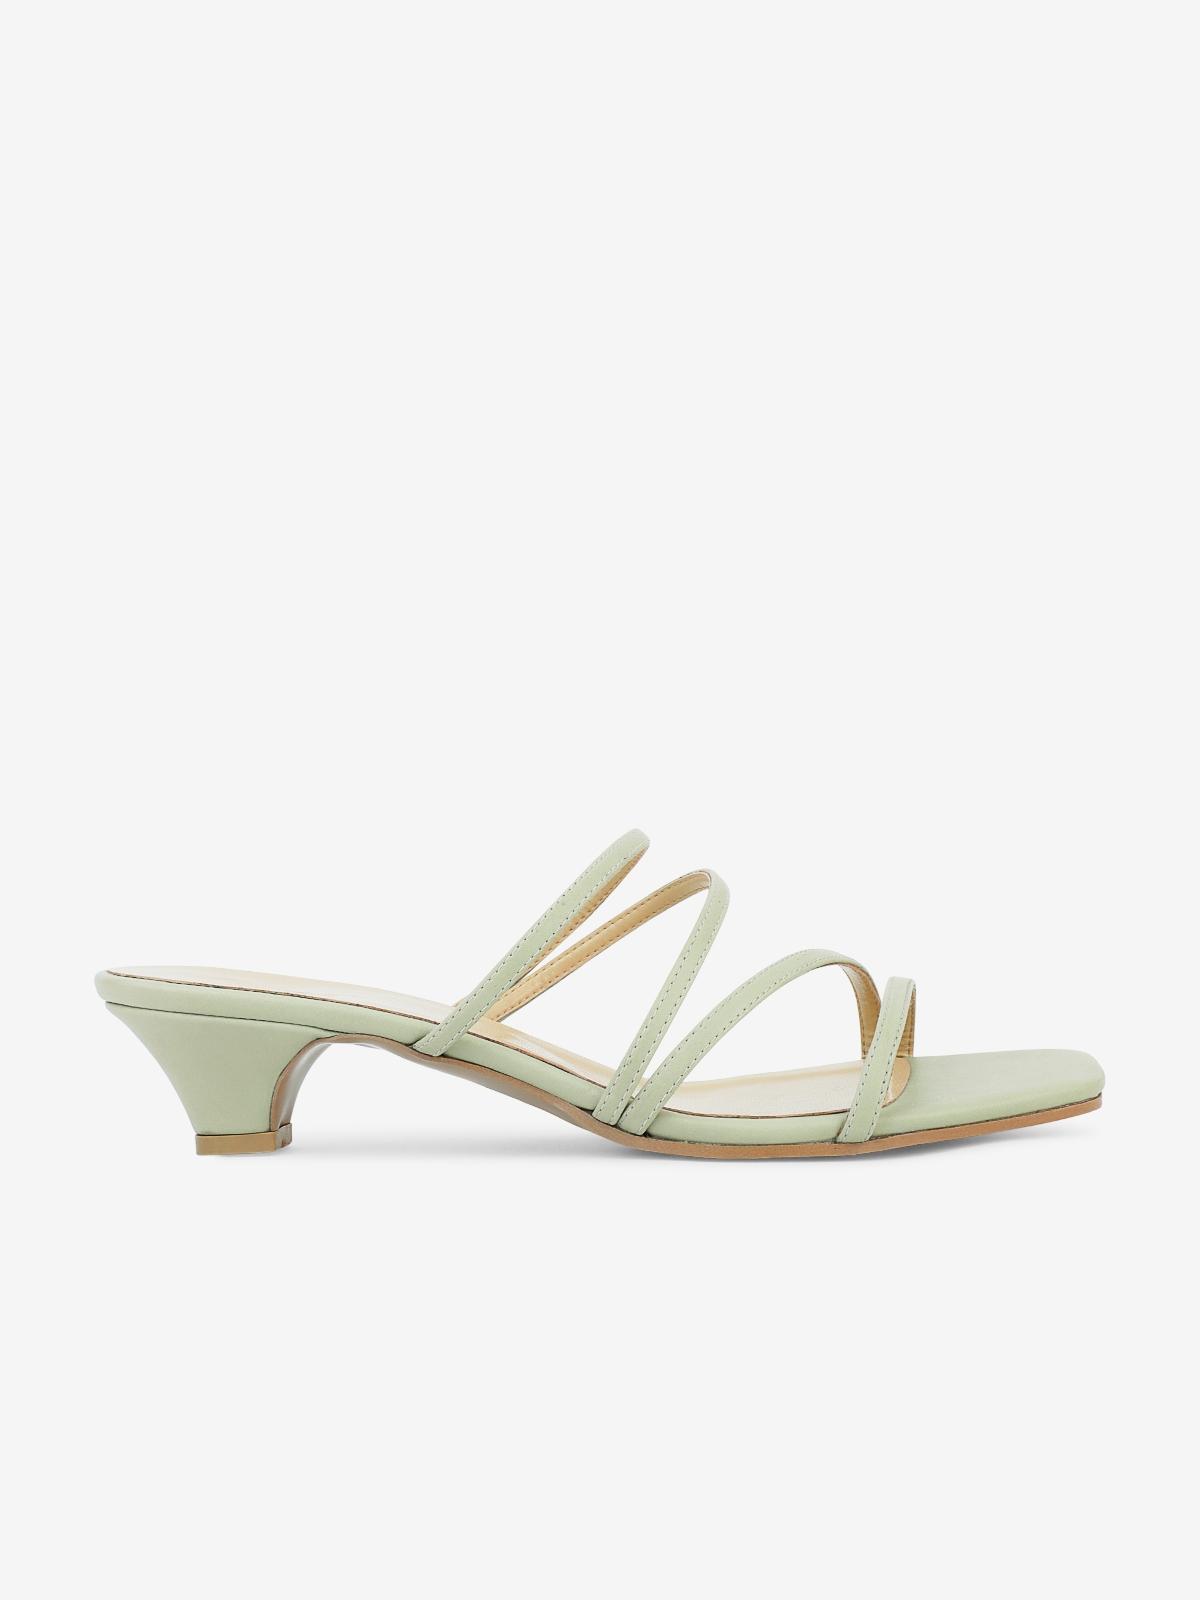 Philia Boutique P05 Kitten Heels Light Green